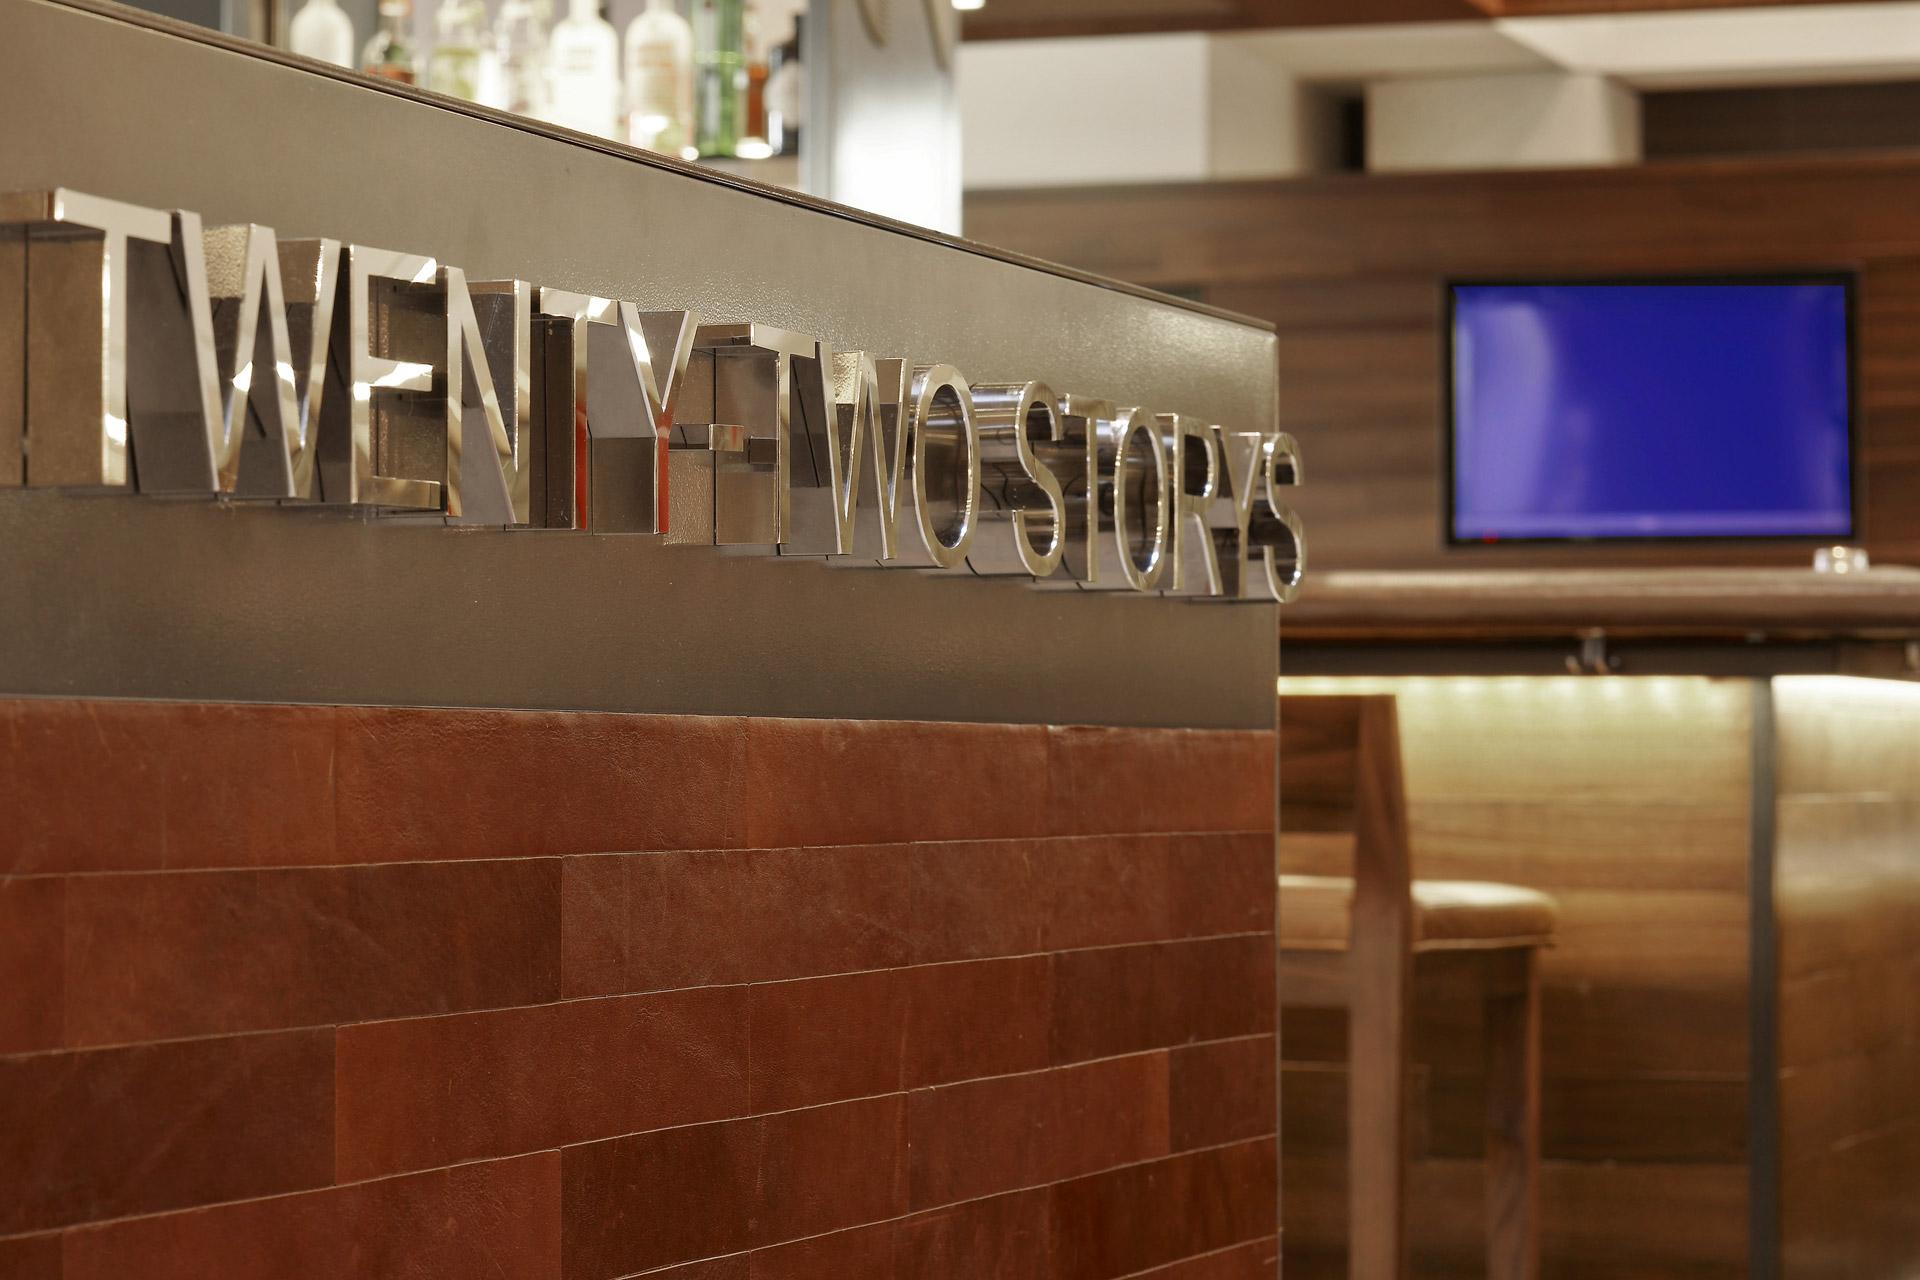 Twenty Two Storys & Market restaurant